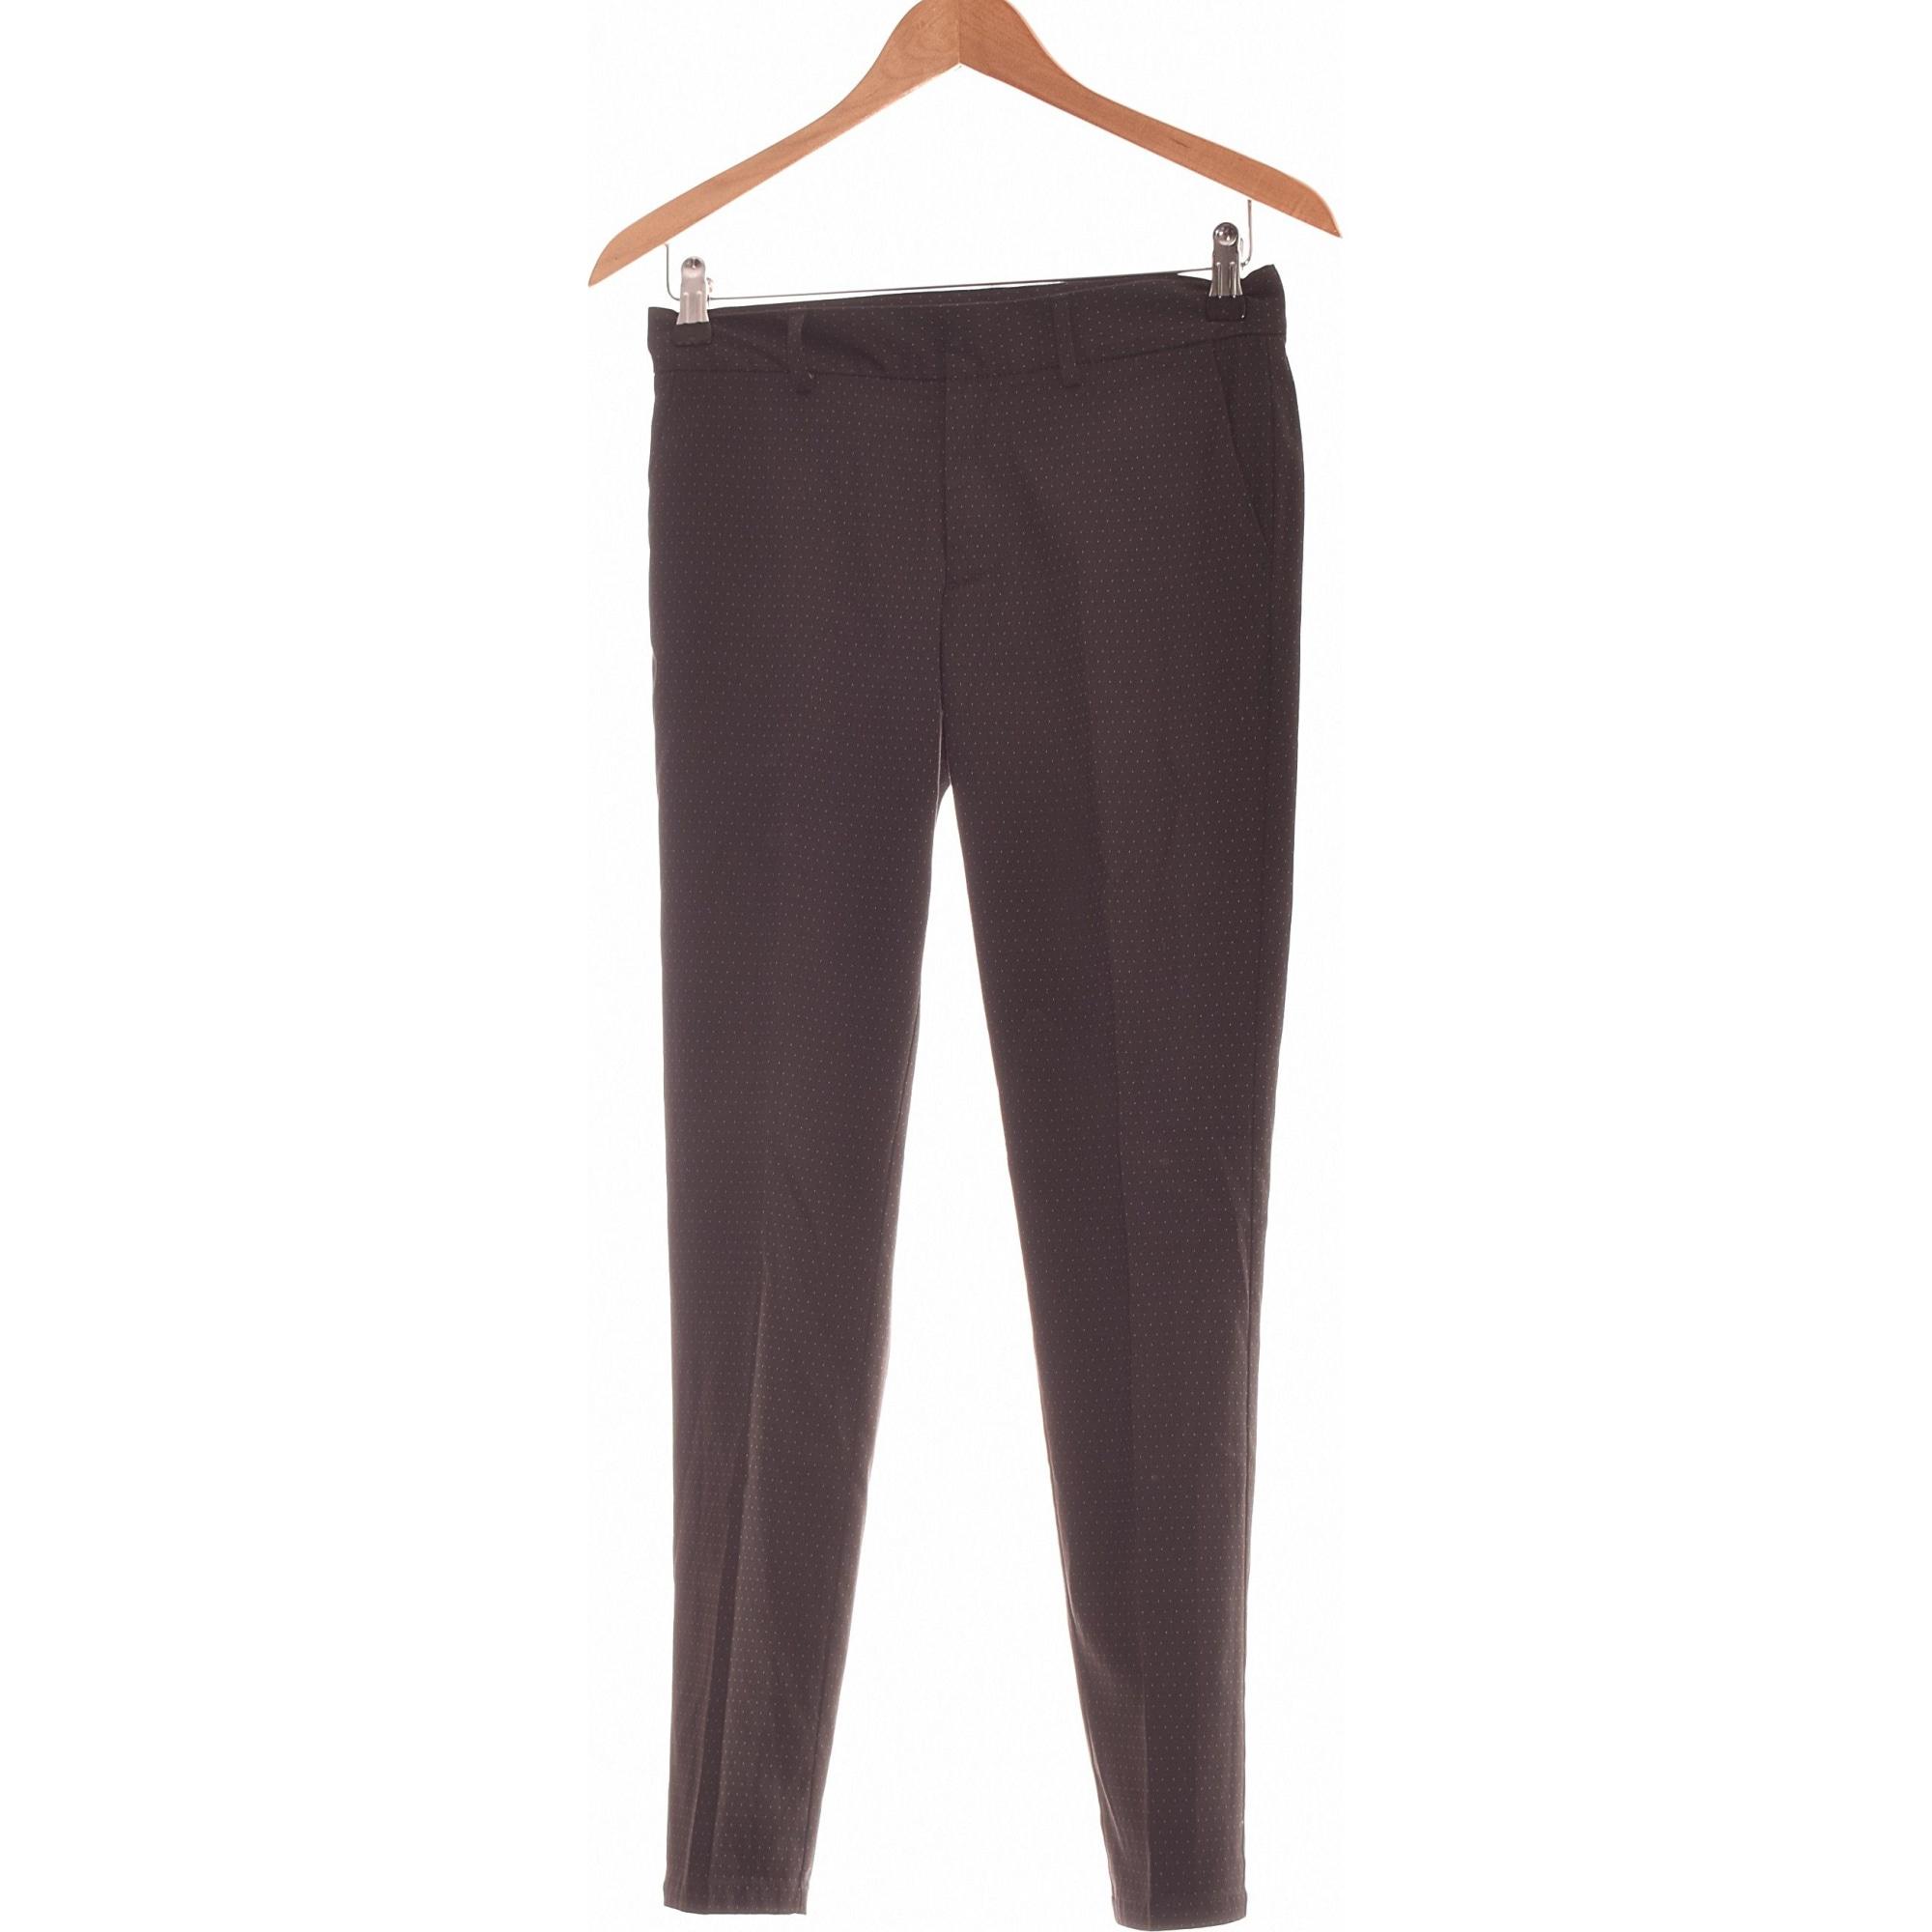 Pantalon slim, cigarette TEDDY SMITH Noir